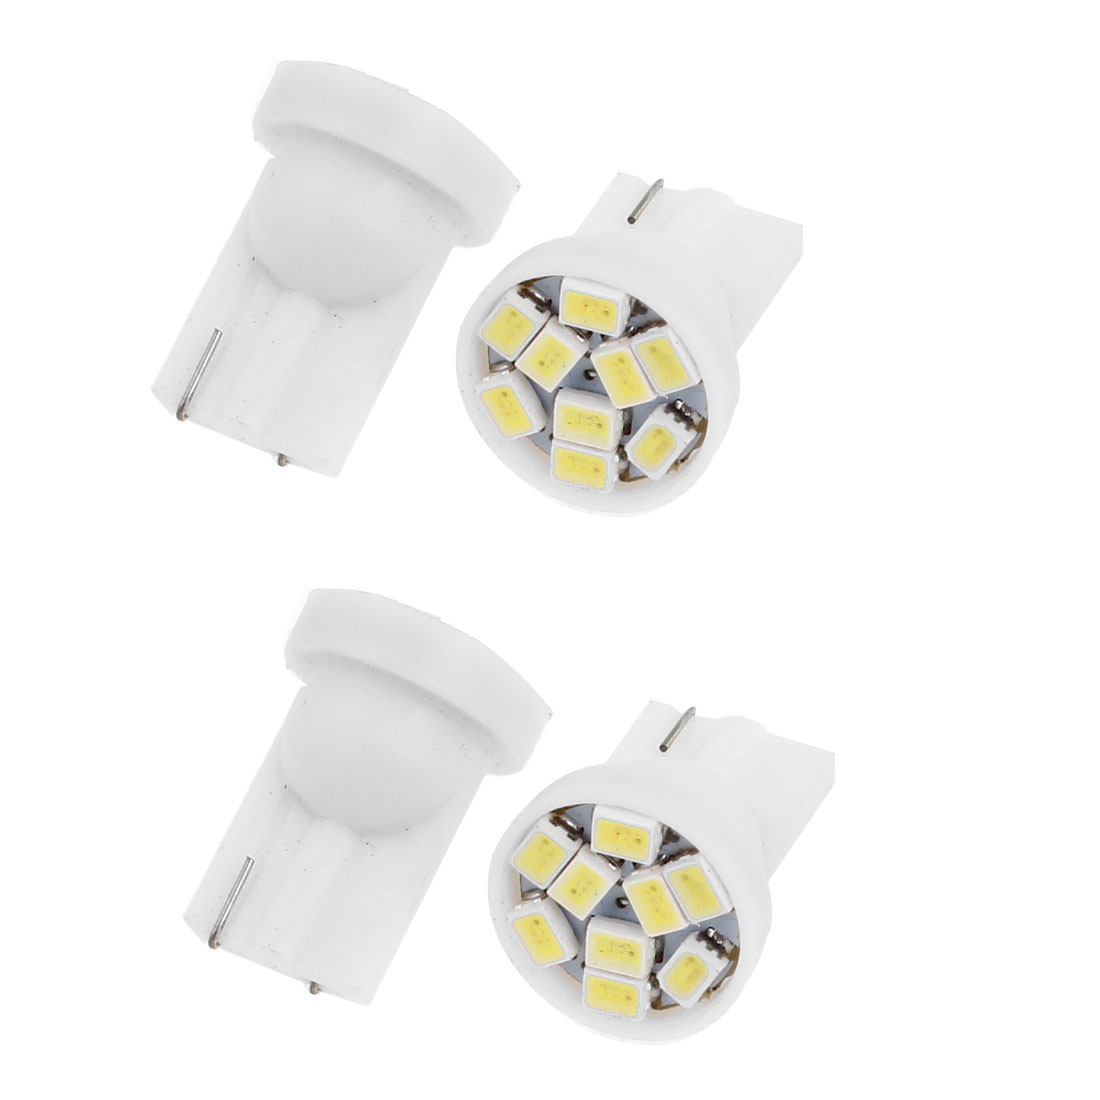 4pcs T10 White 9 LED 1206 SMD Dashboard Side Marker Light Bulb for Car